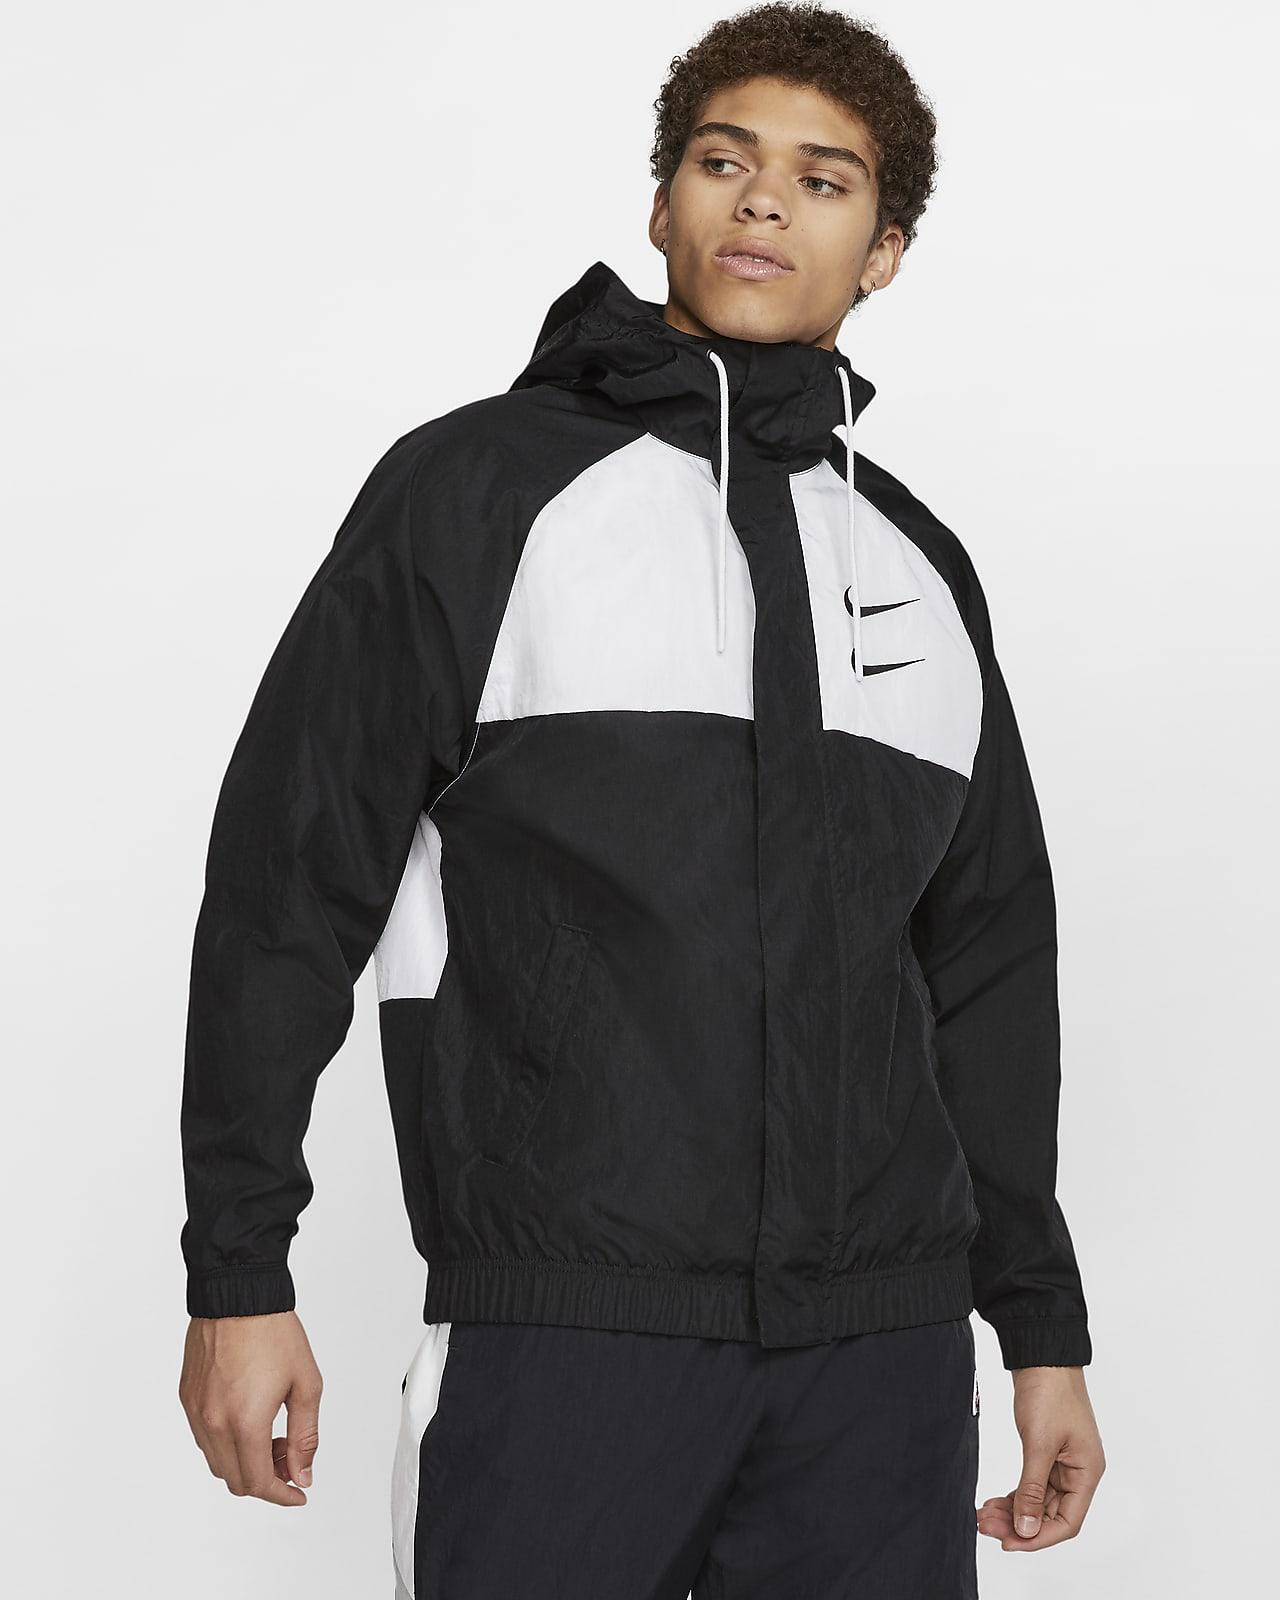 Nike Sportswear Swoosh Herren Webjacke mit Kapuze